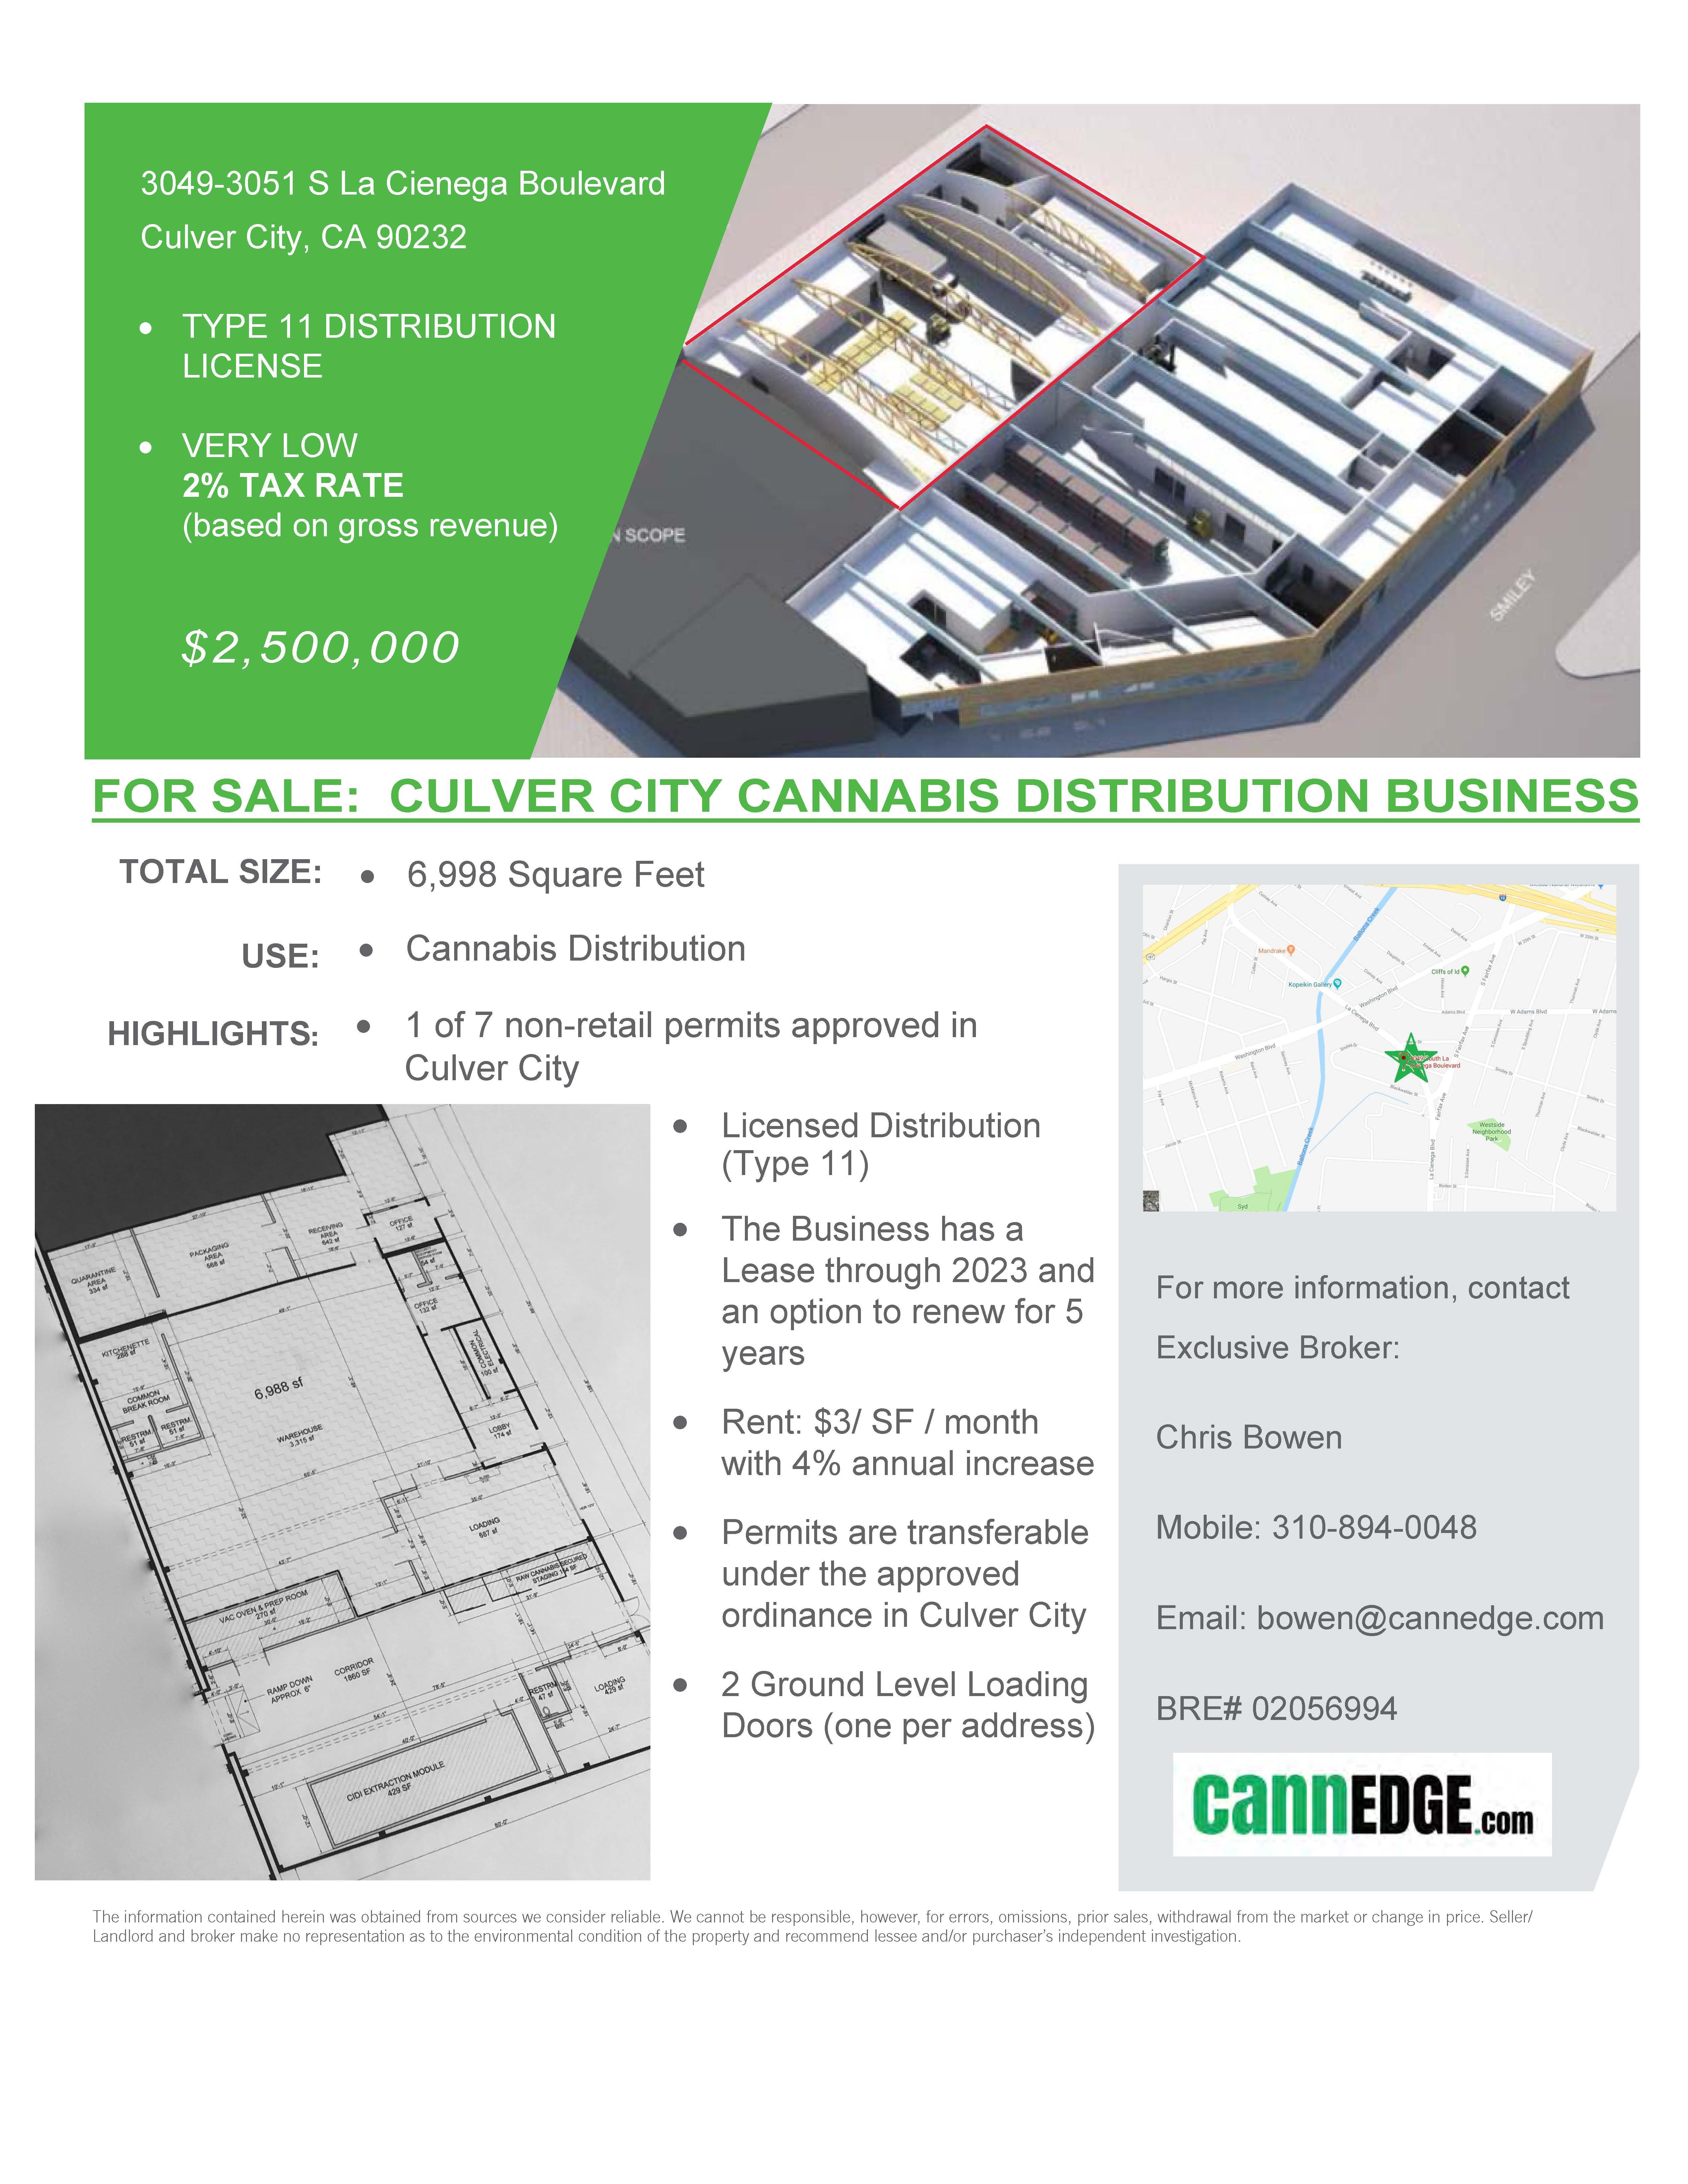 Culver City Final Distribution Business - Flyer . (1) (1)